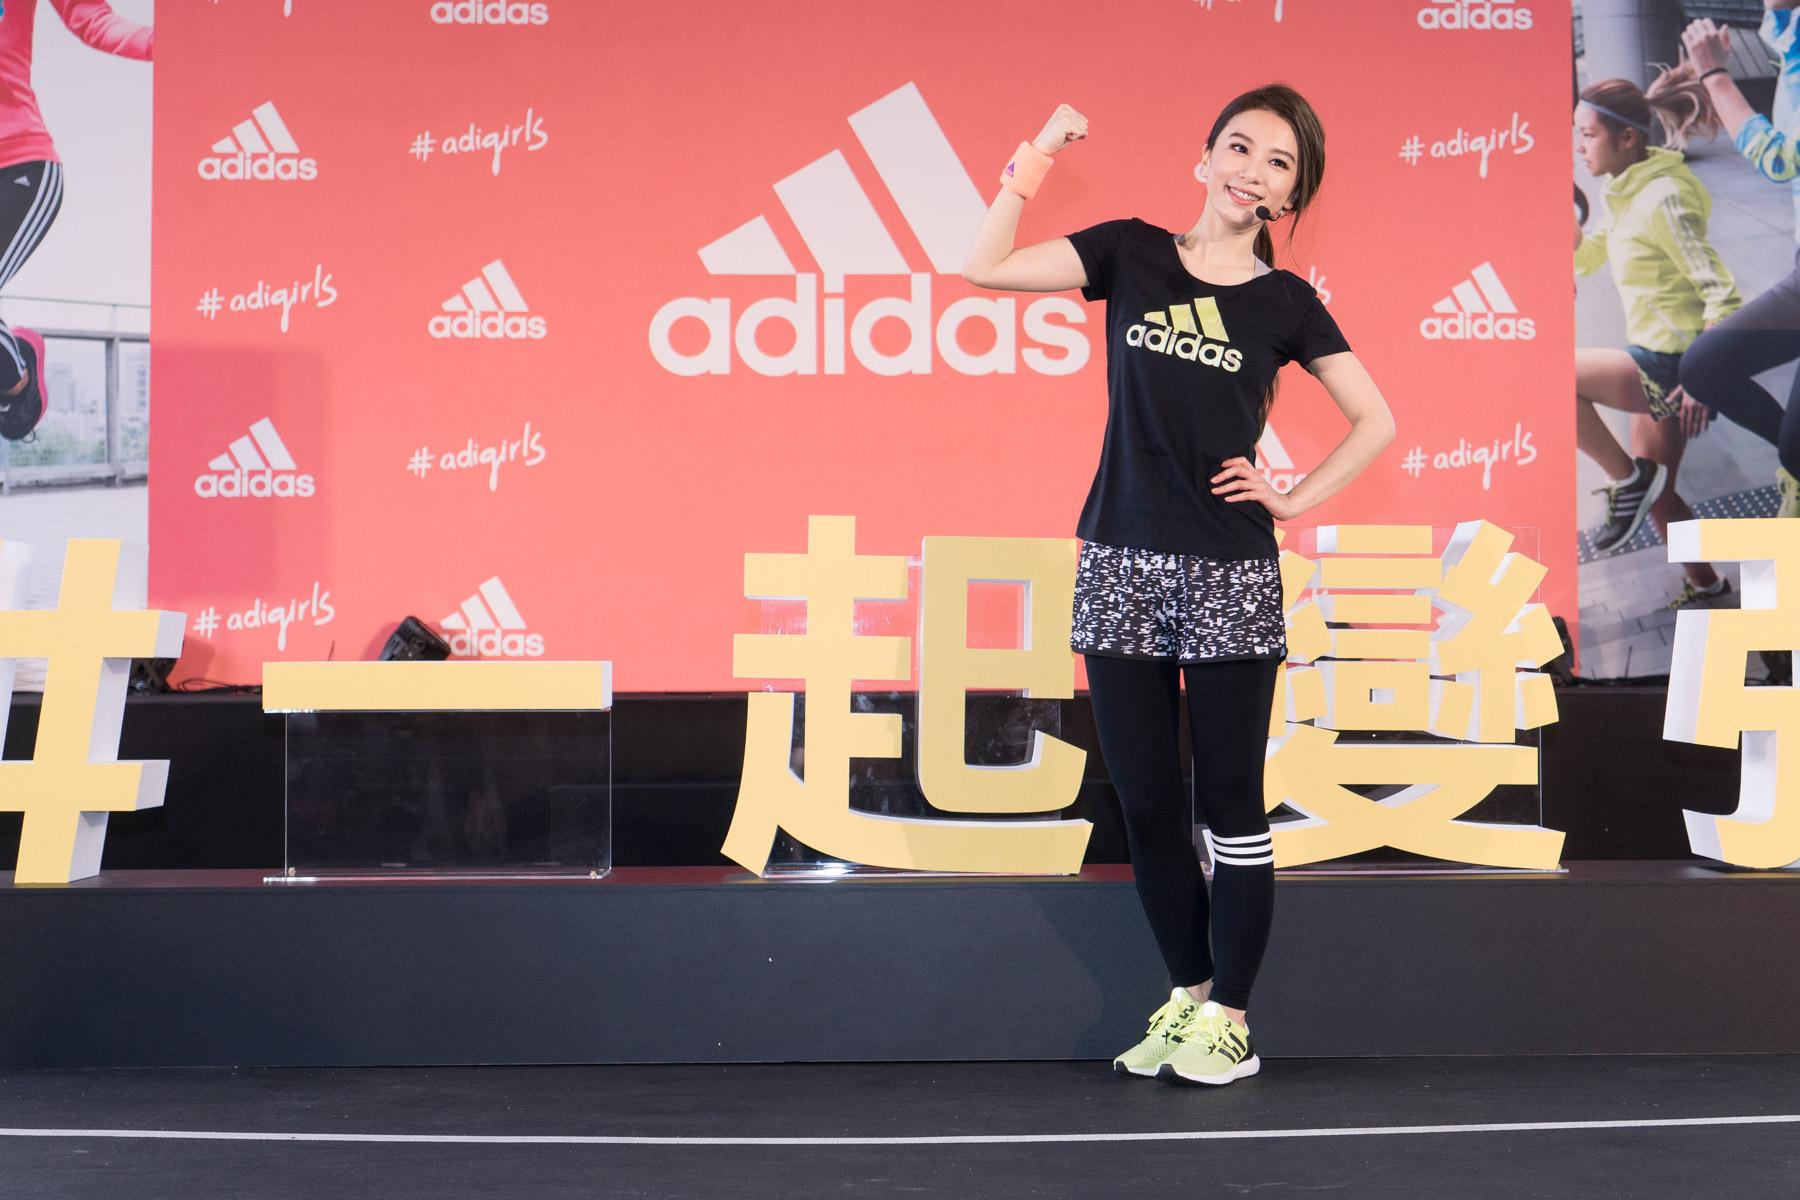 adidas-adigirls press conference 20150924-15